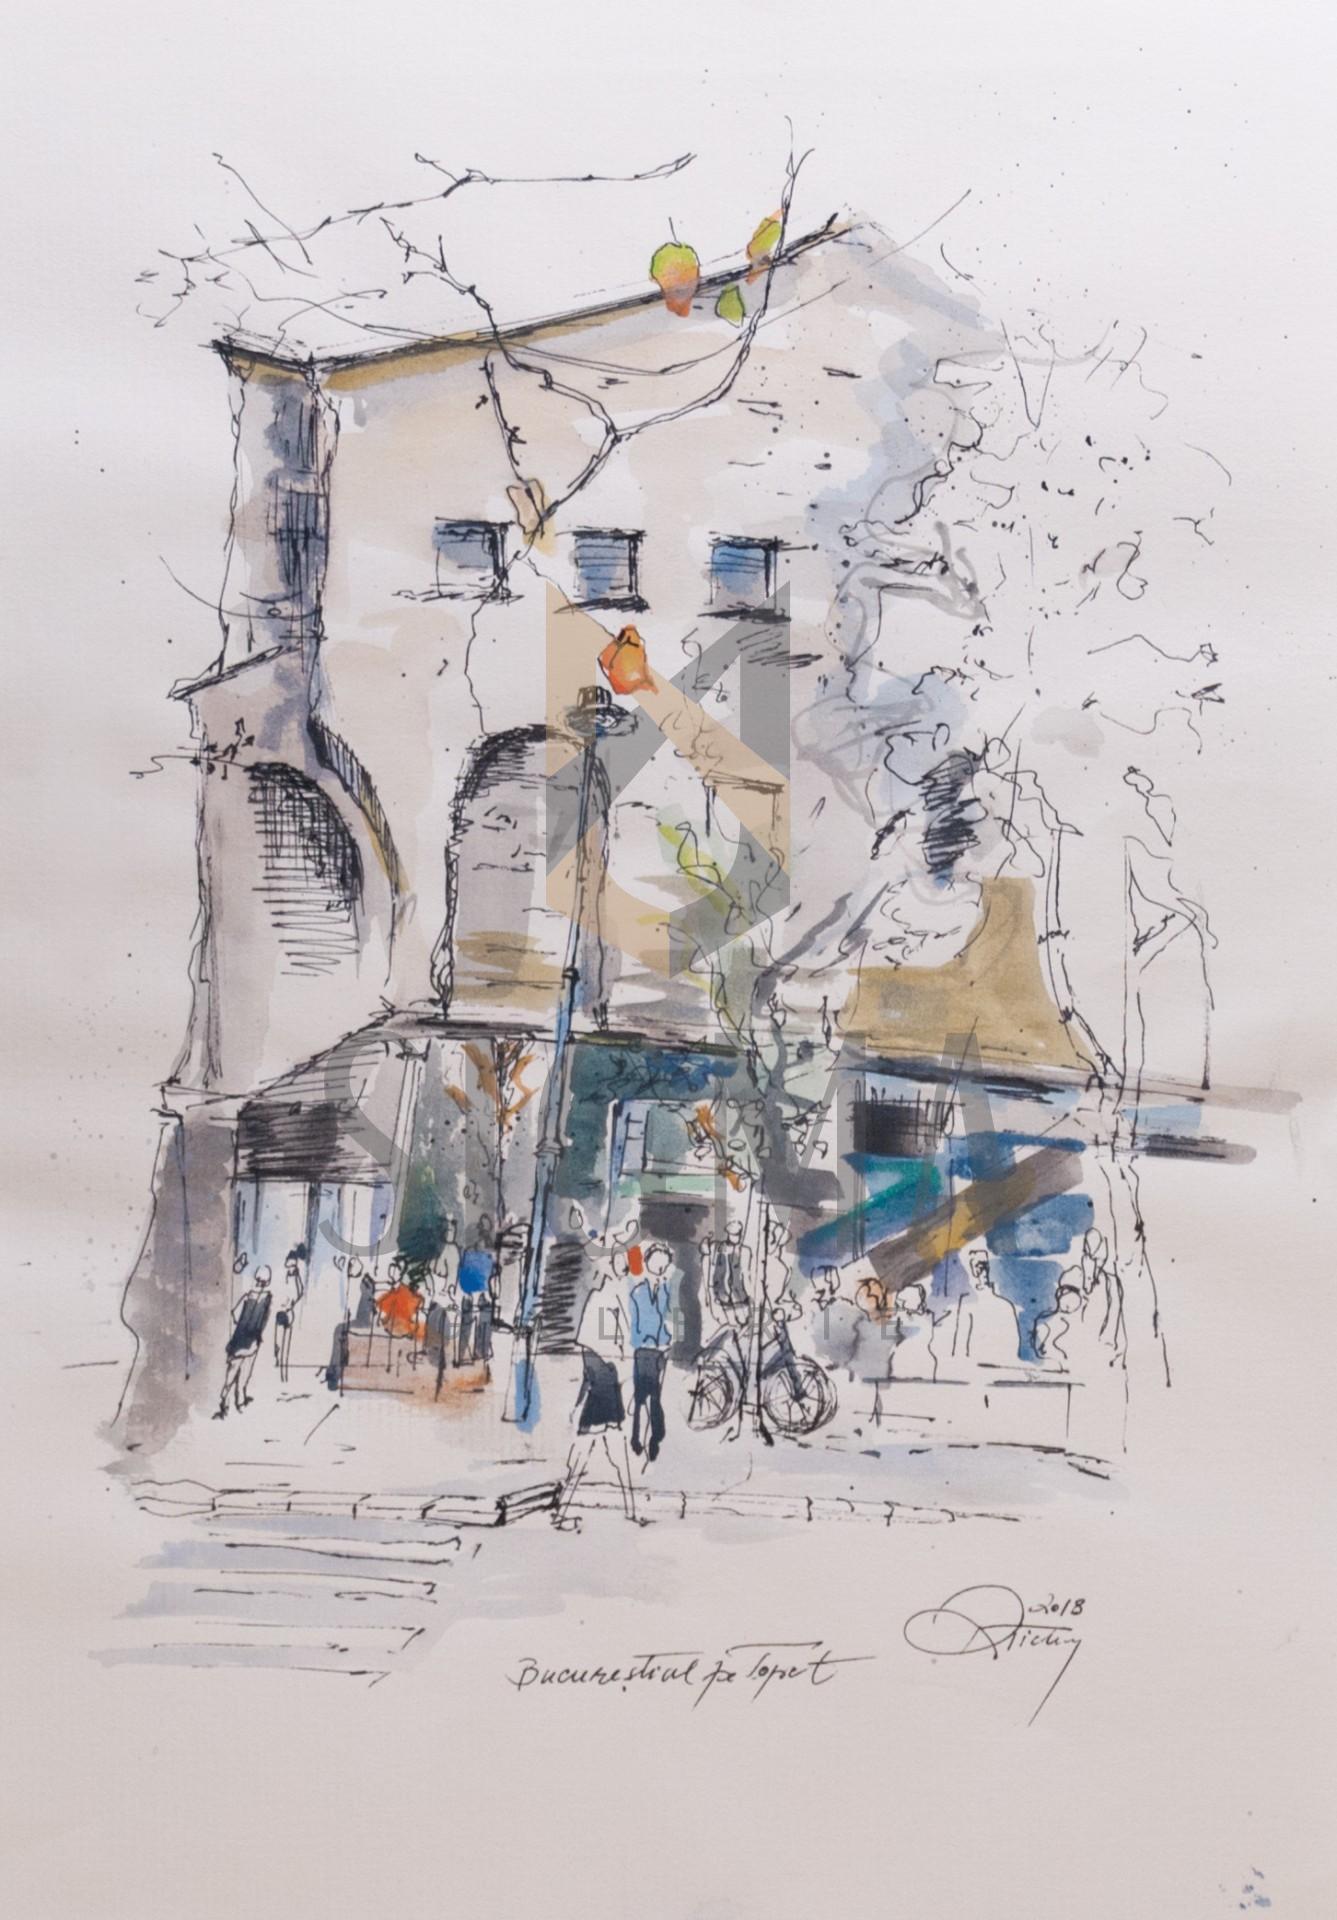 Tablou, Rodica Tichindelean, - Bulevardul Primaverii - acuarela si tus, 30x21 cm